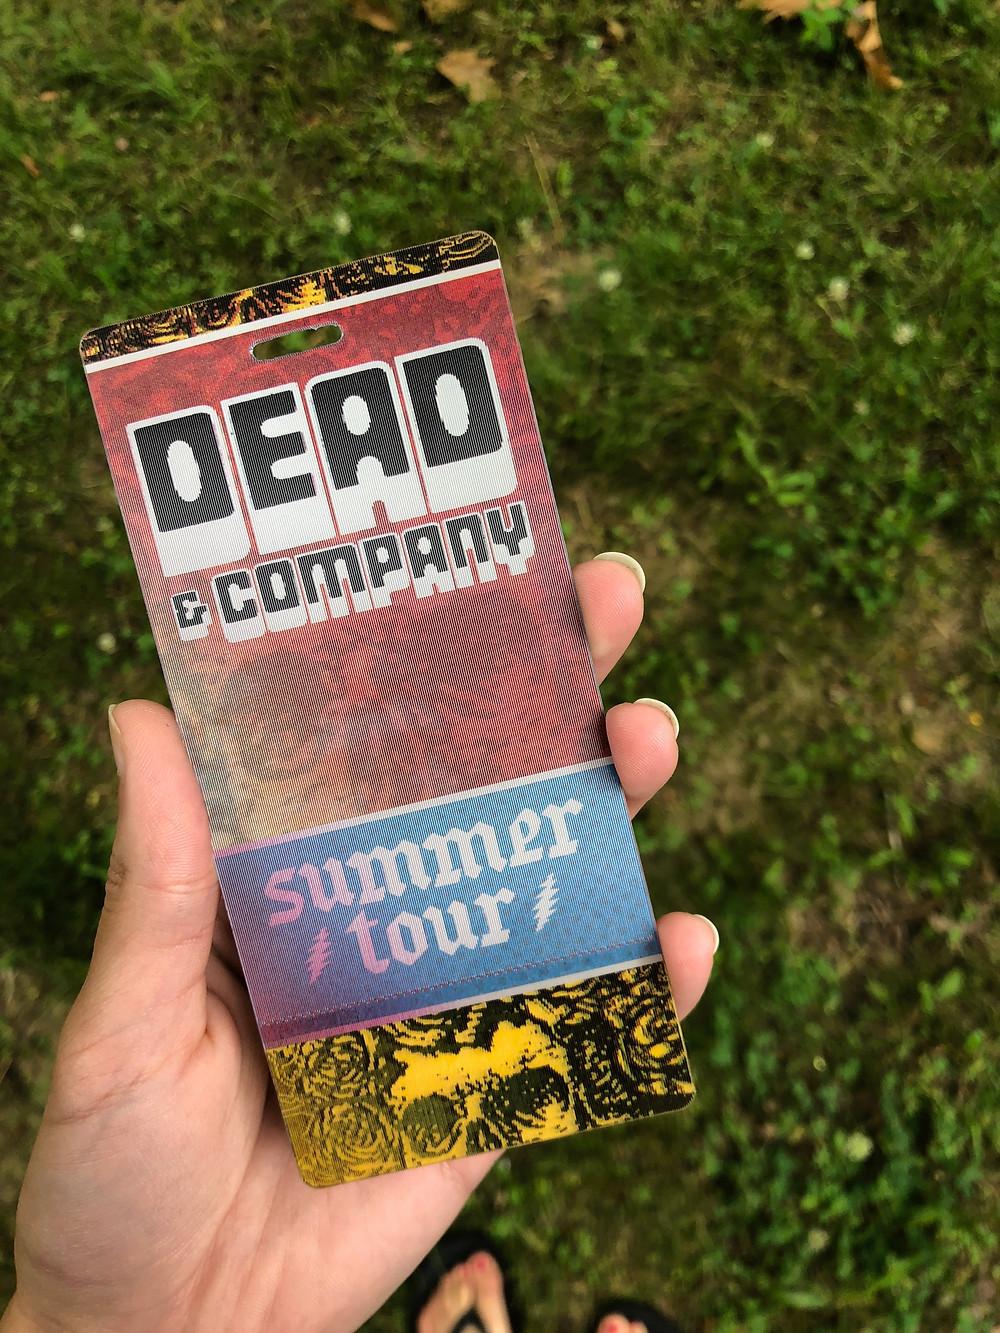 Dead & Company ticket